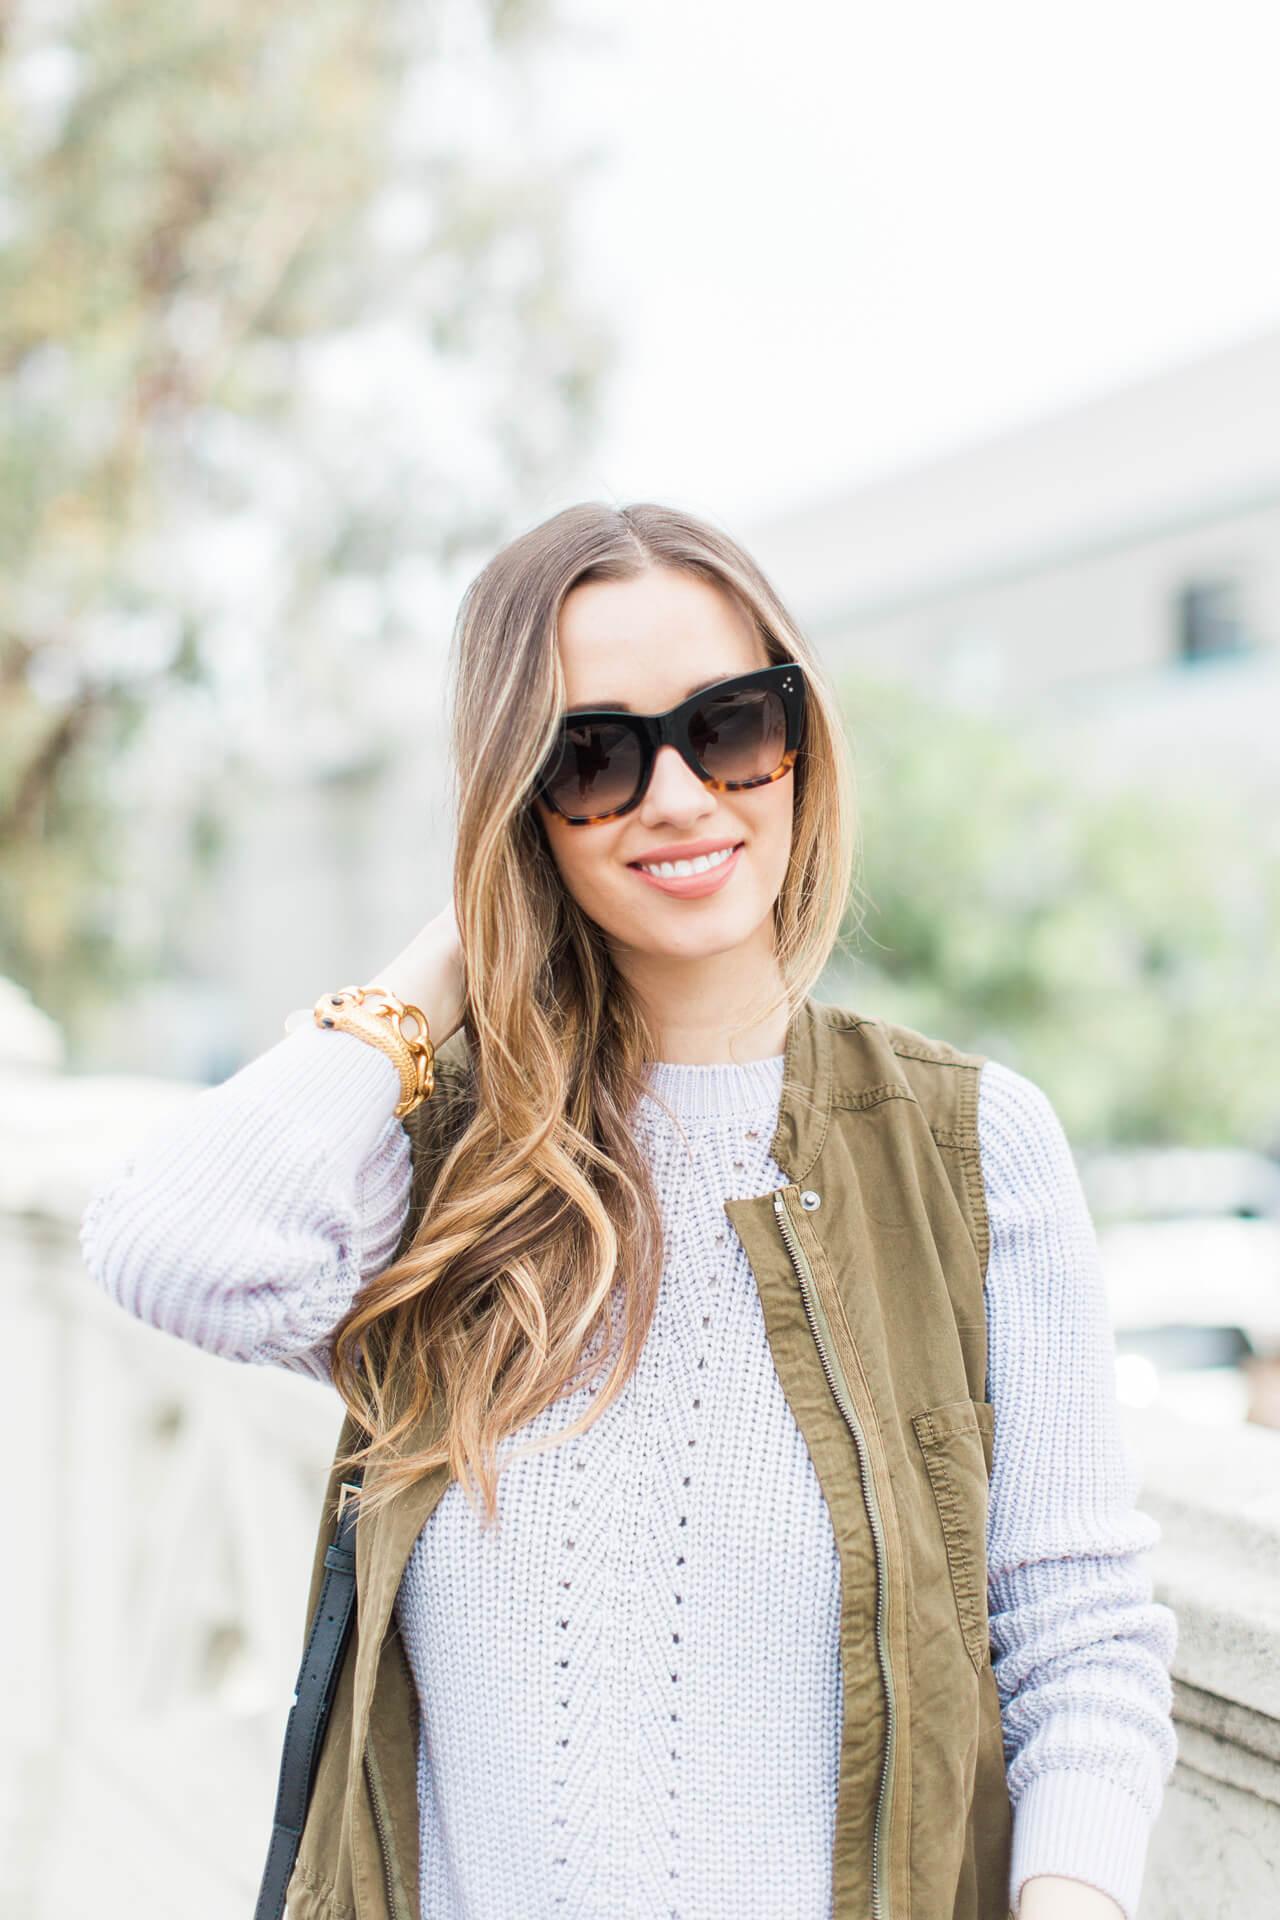 celine catherine sunglasses